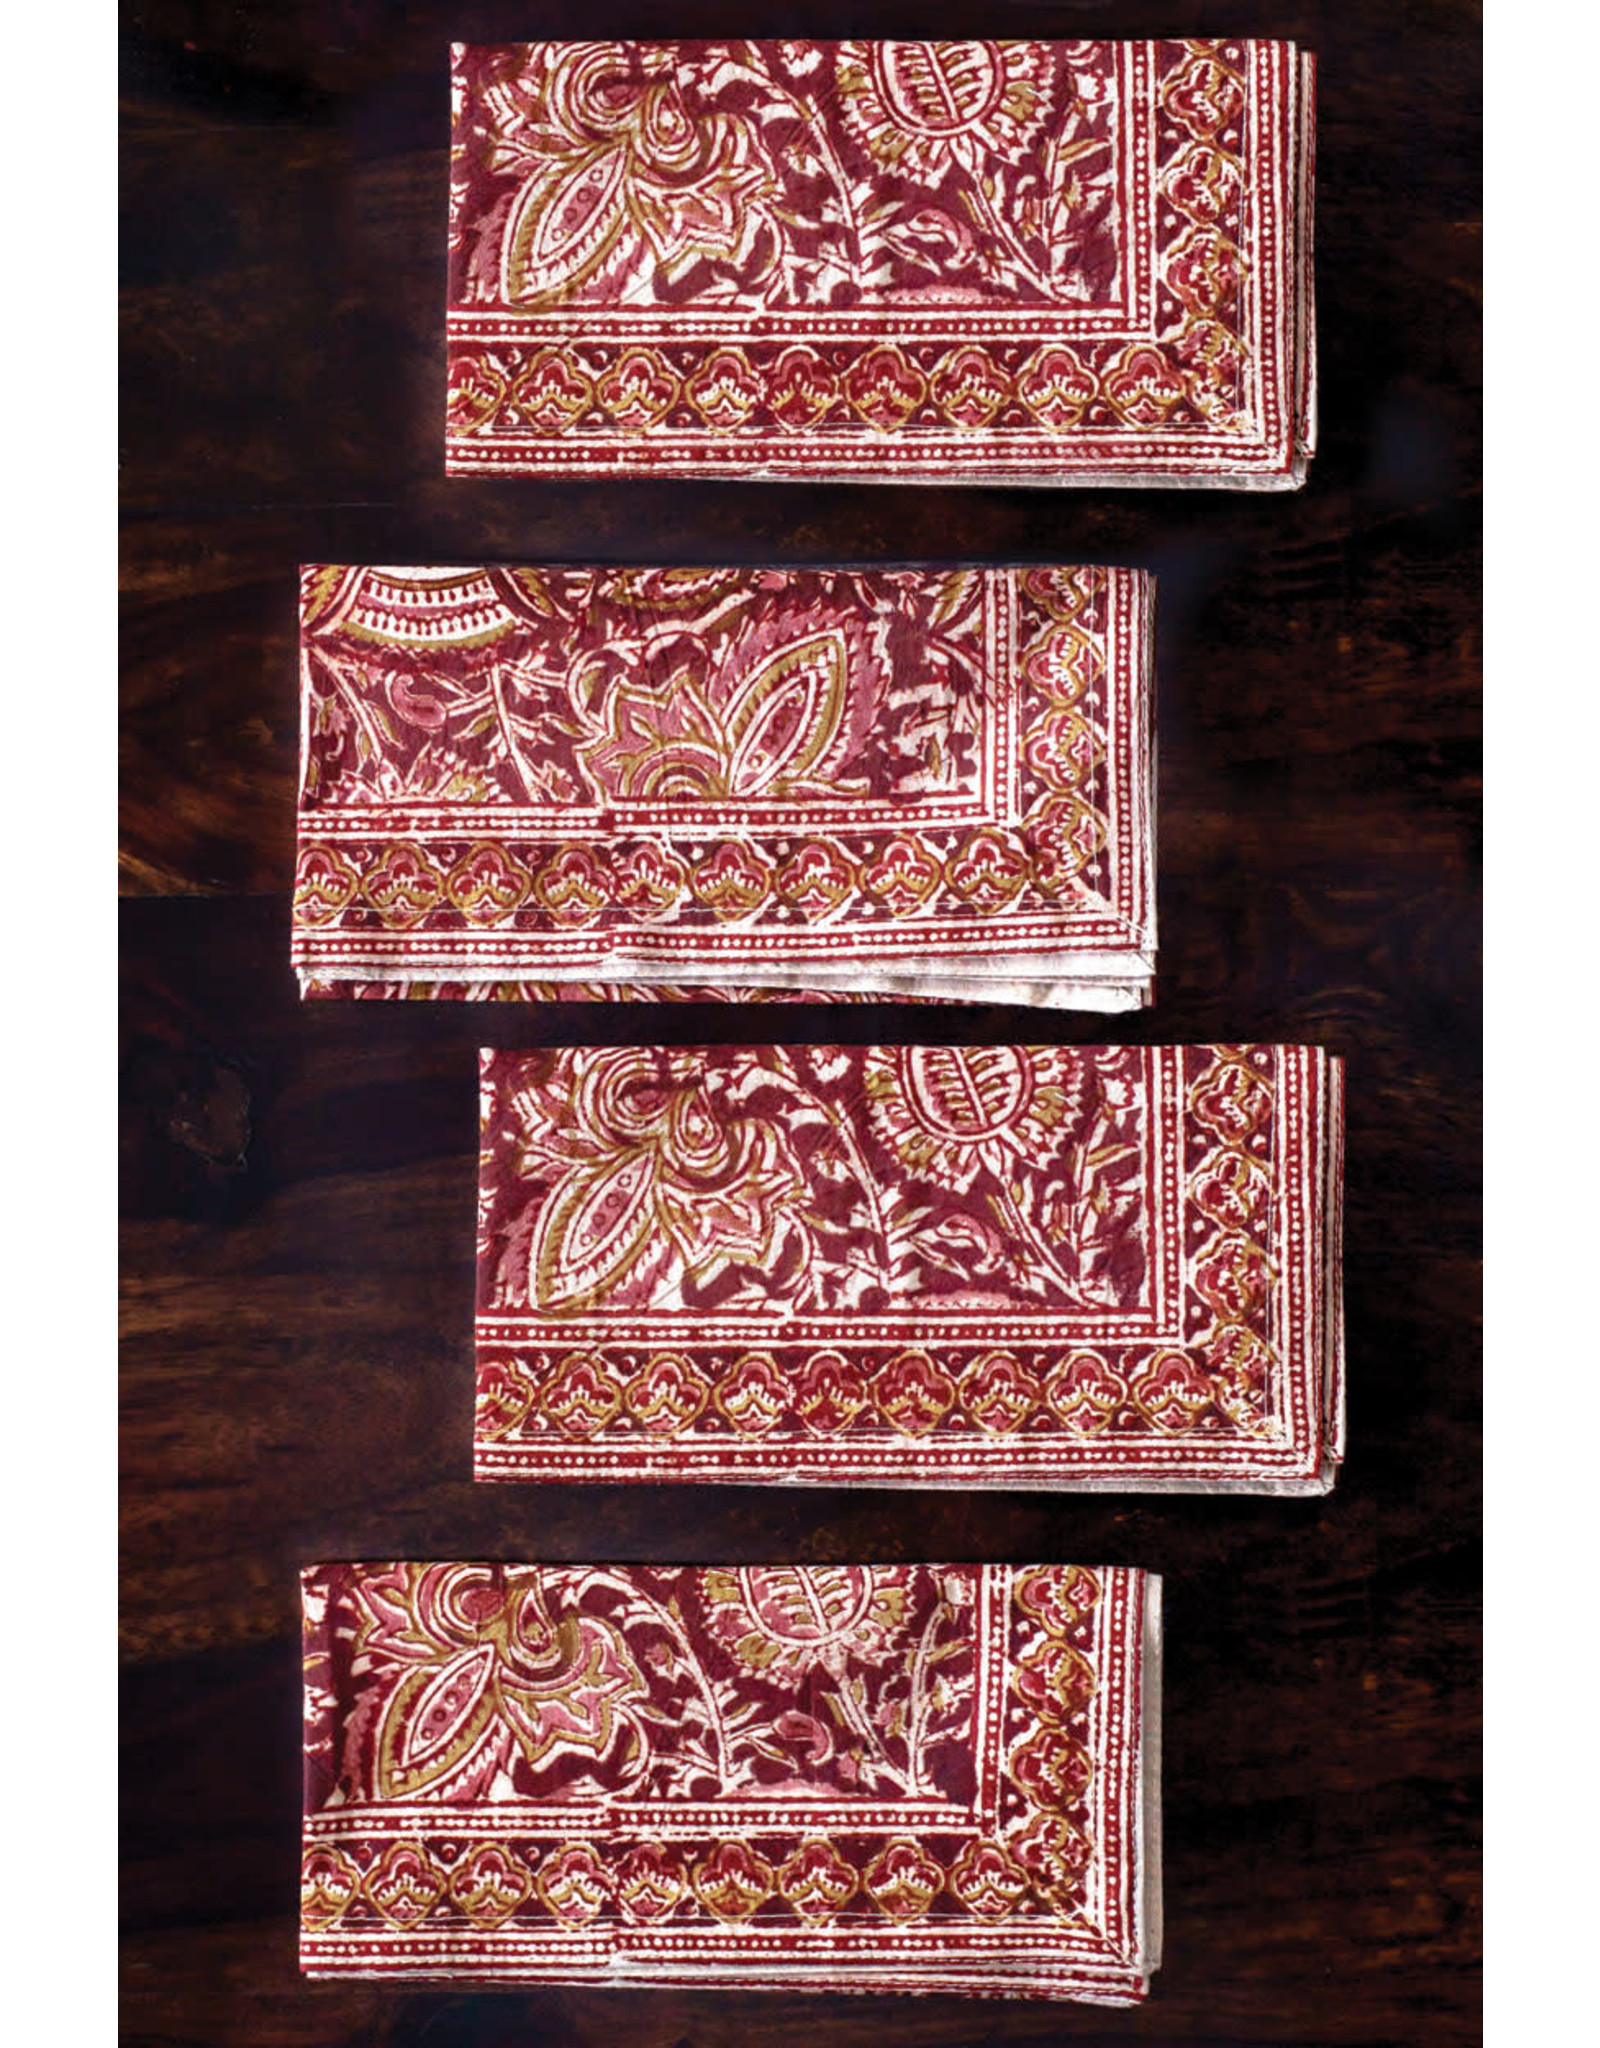 Sevya Kalamkari Napkin- Terracotta and Cranberry, set of 4